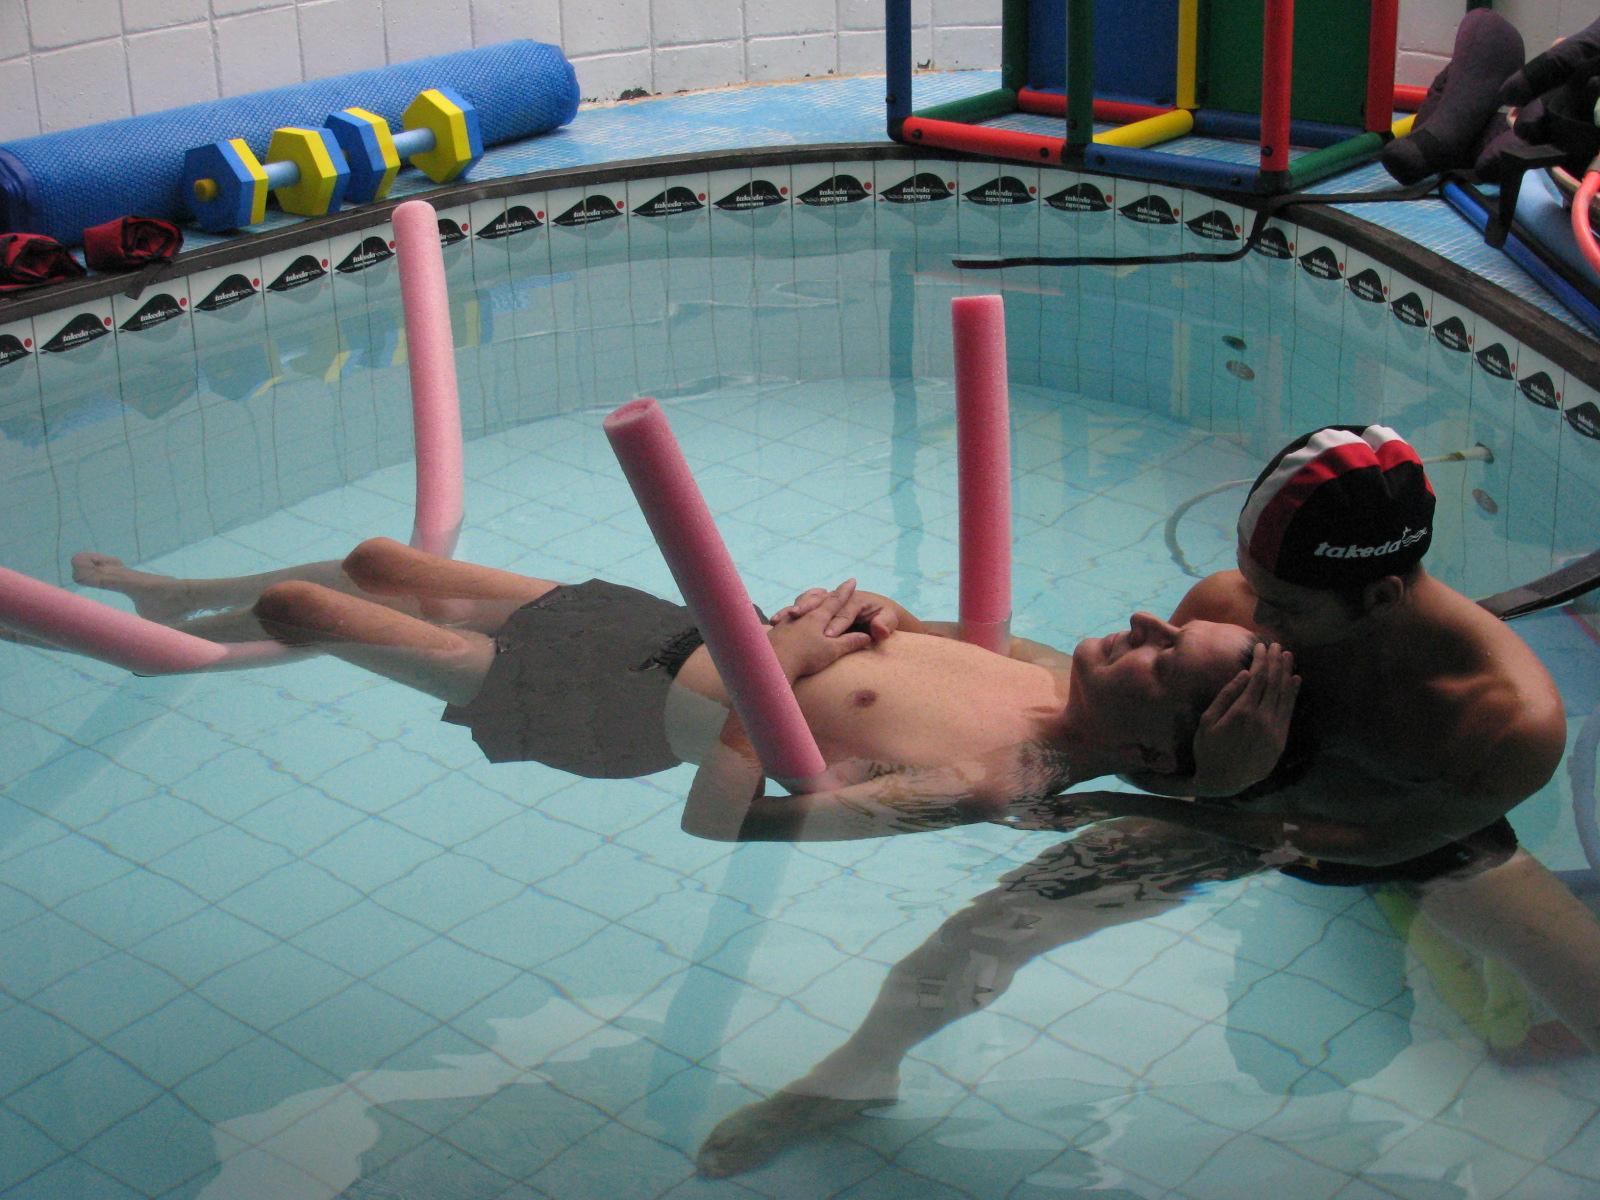 Depois de fortalecer os músculos, Juca Kfouri relaxa